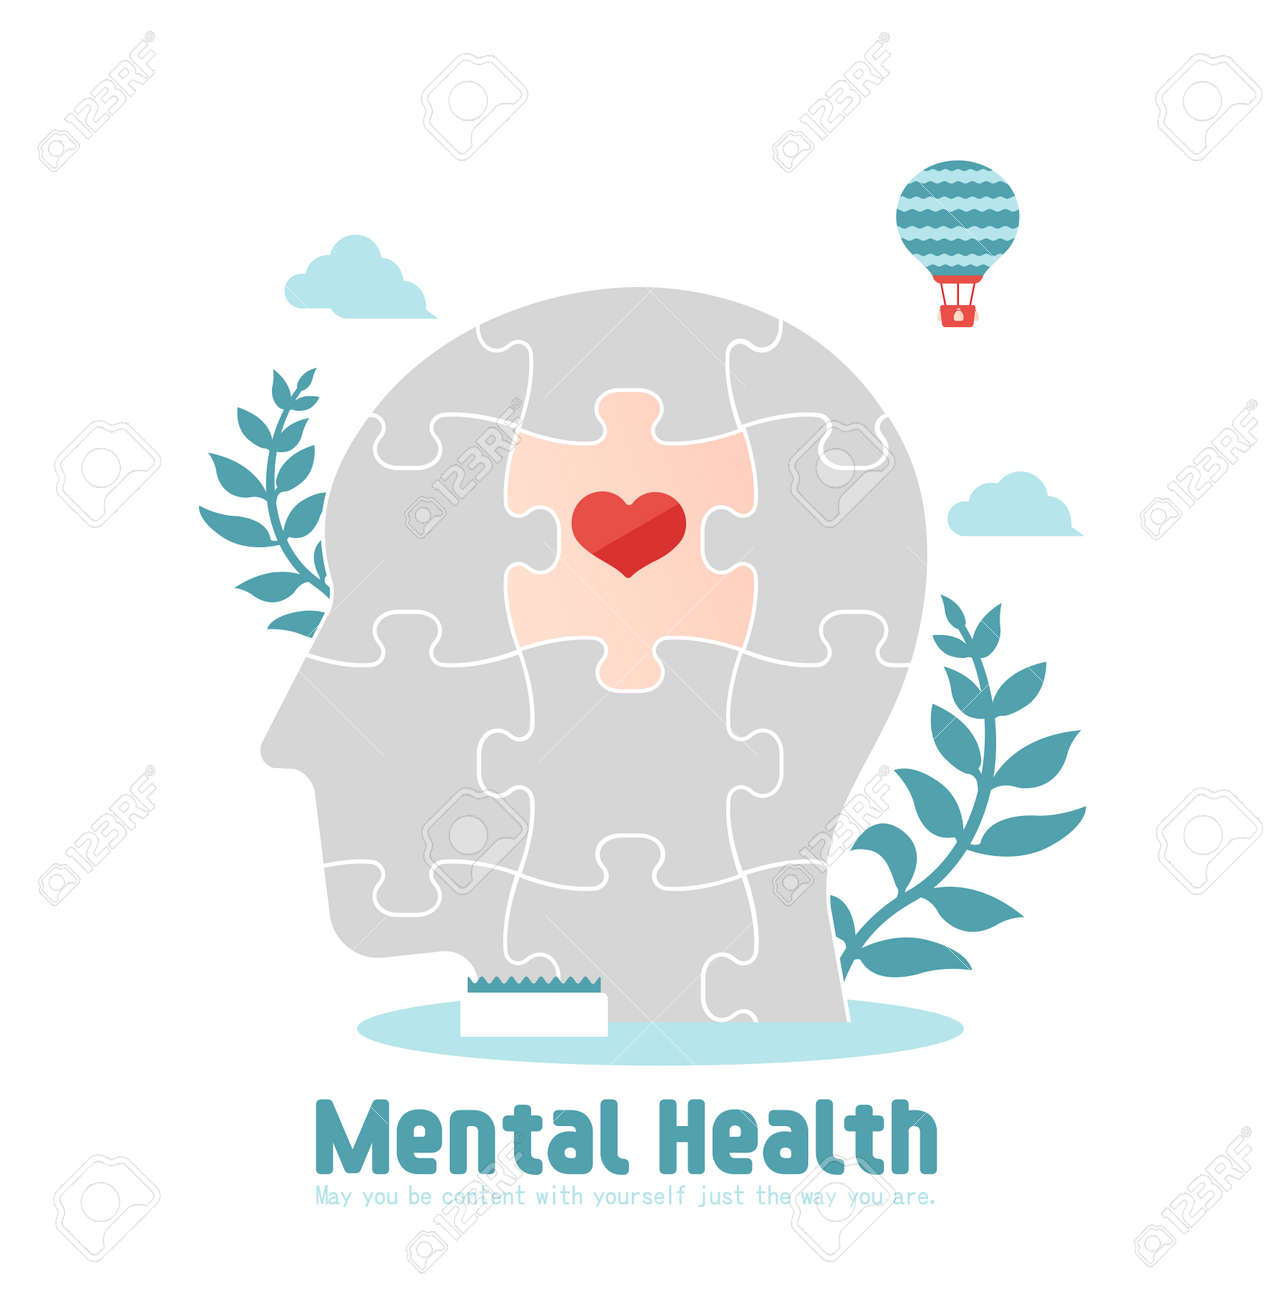 Mental health concept flat vector illustration - 169249614